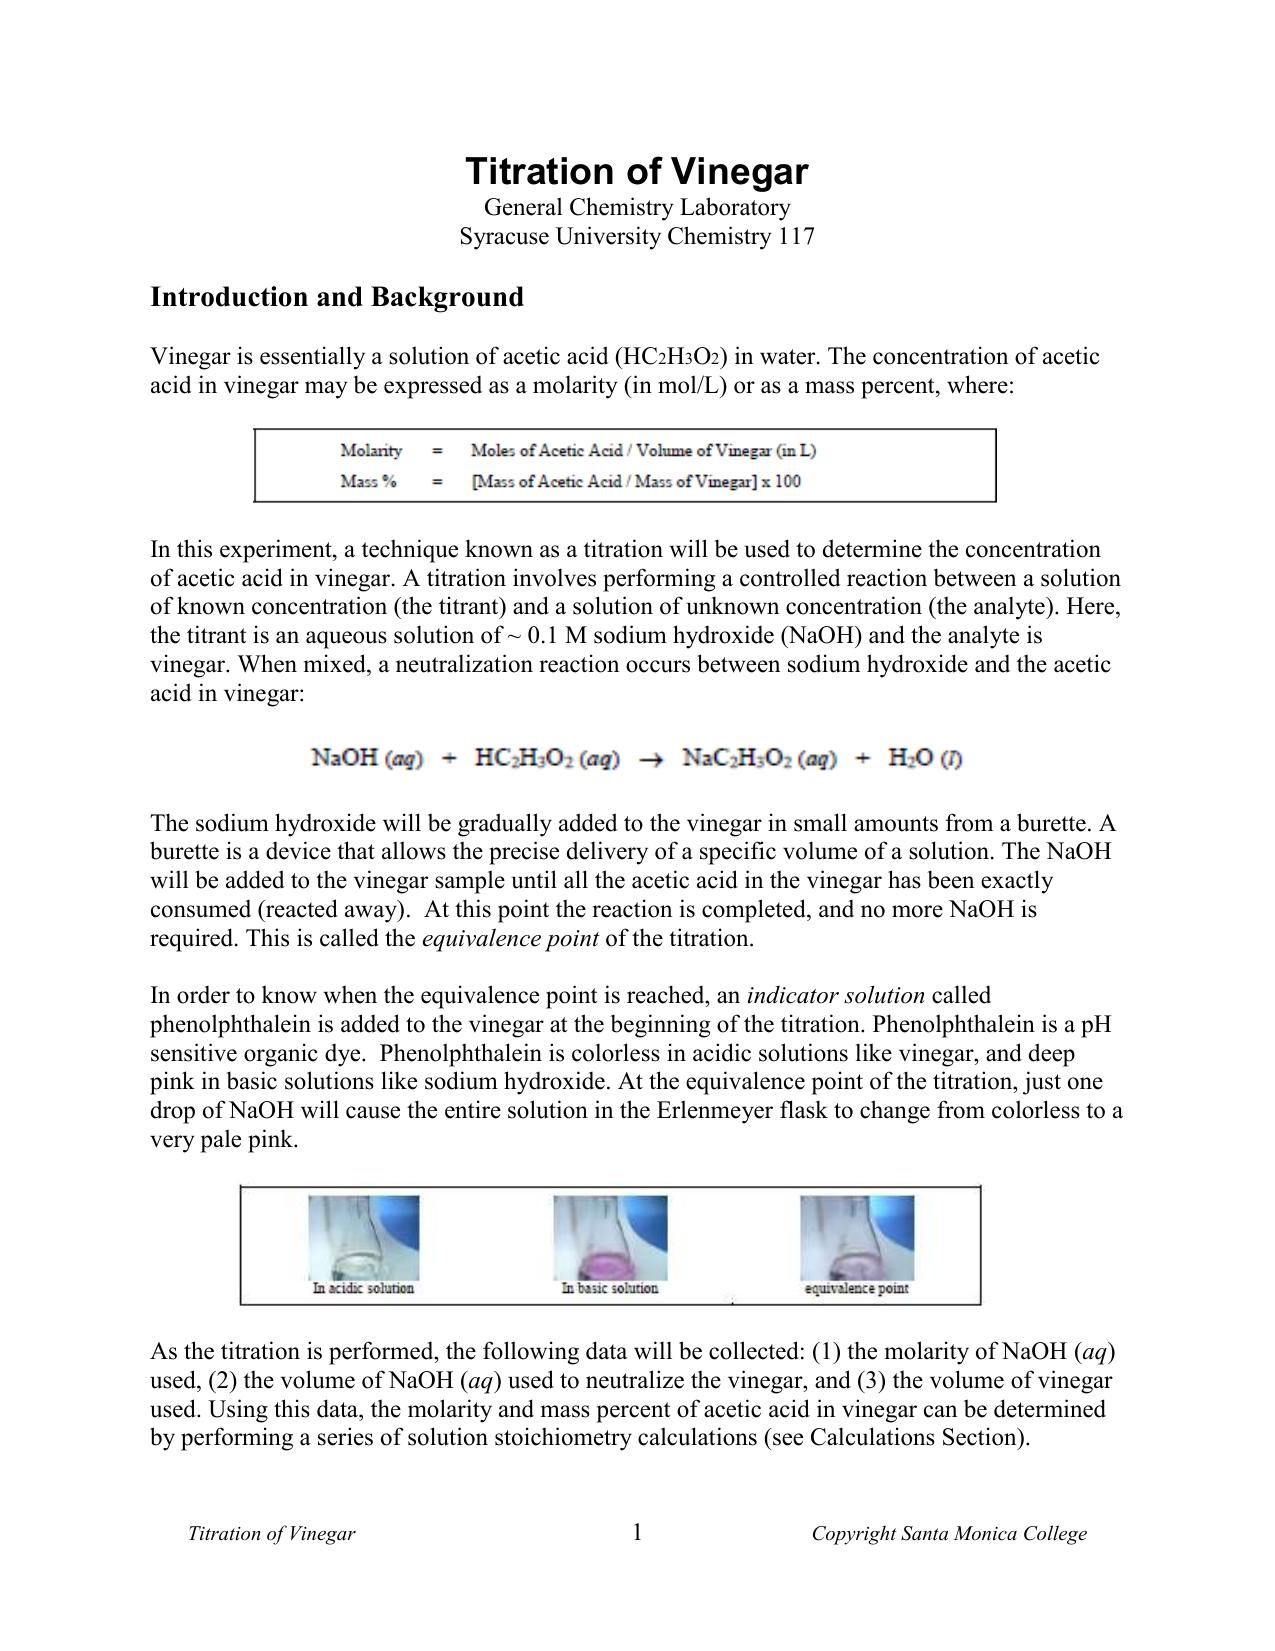 tritation of acidic acid with naoh